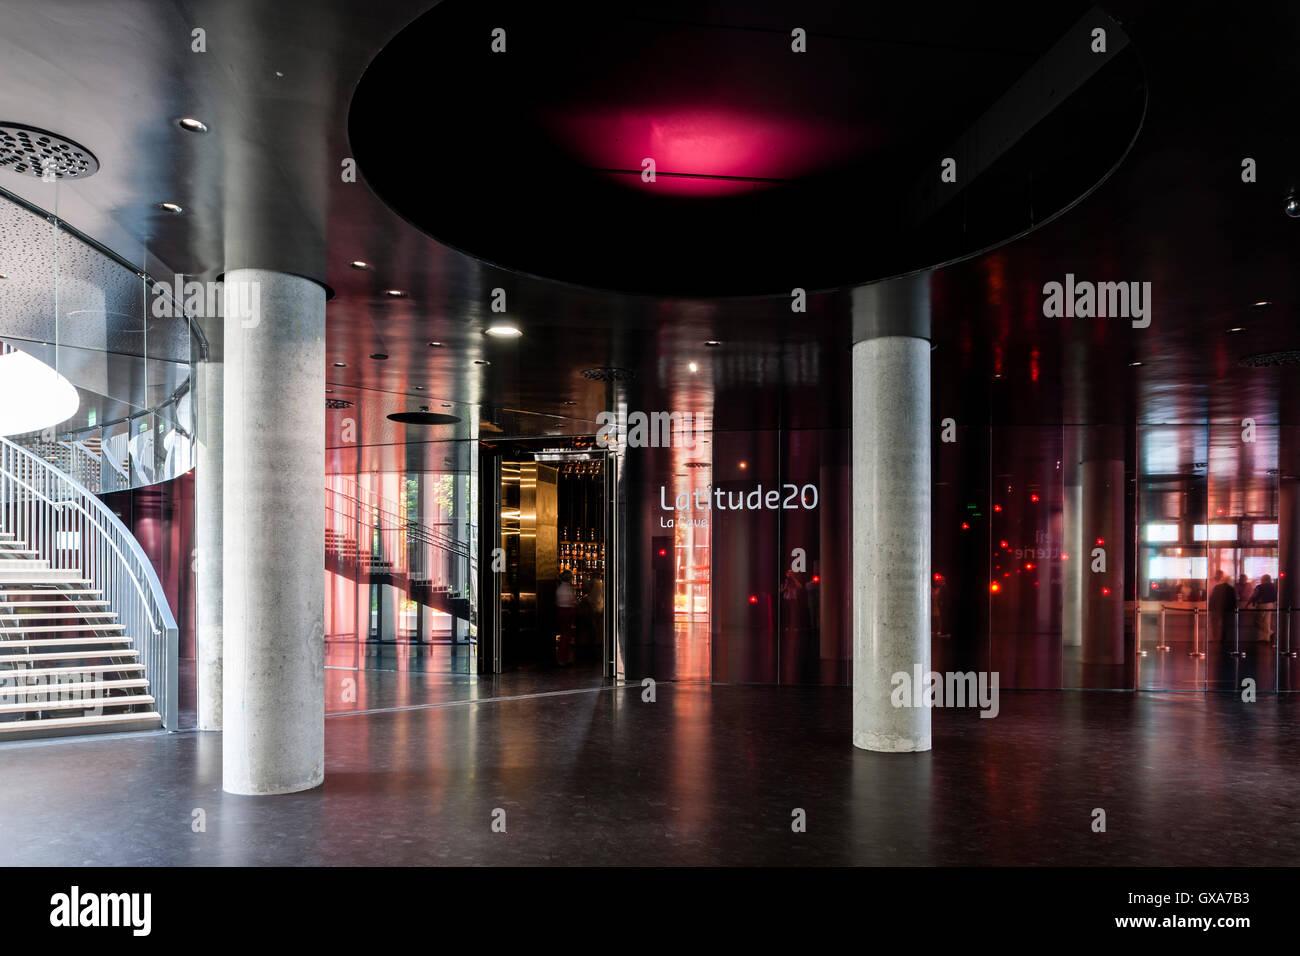 Ground floor lobby and entrance to Latitude 20 panoramic wine cellar ...